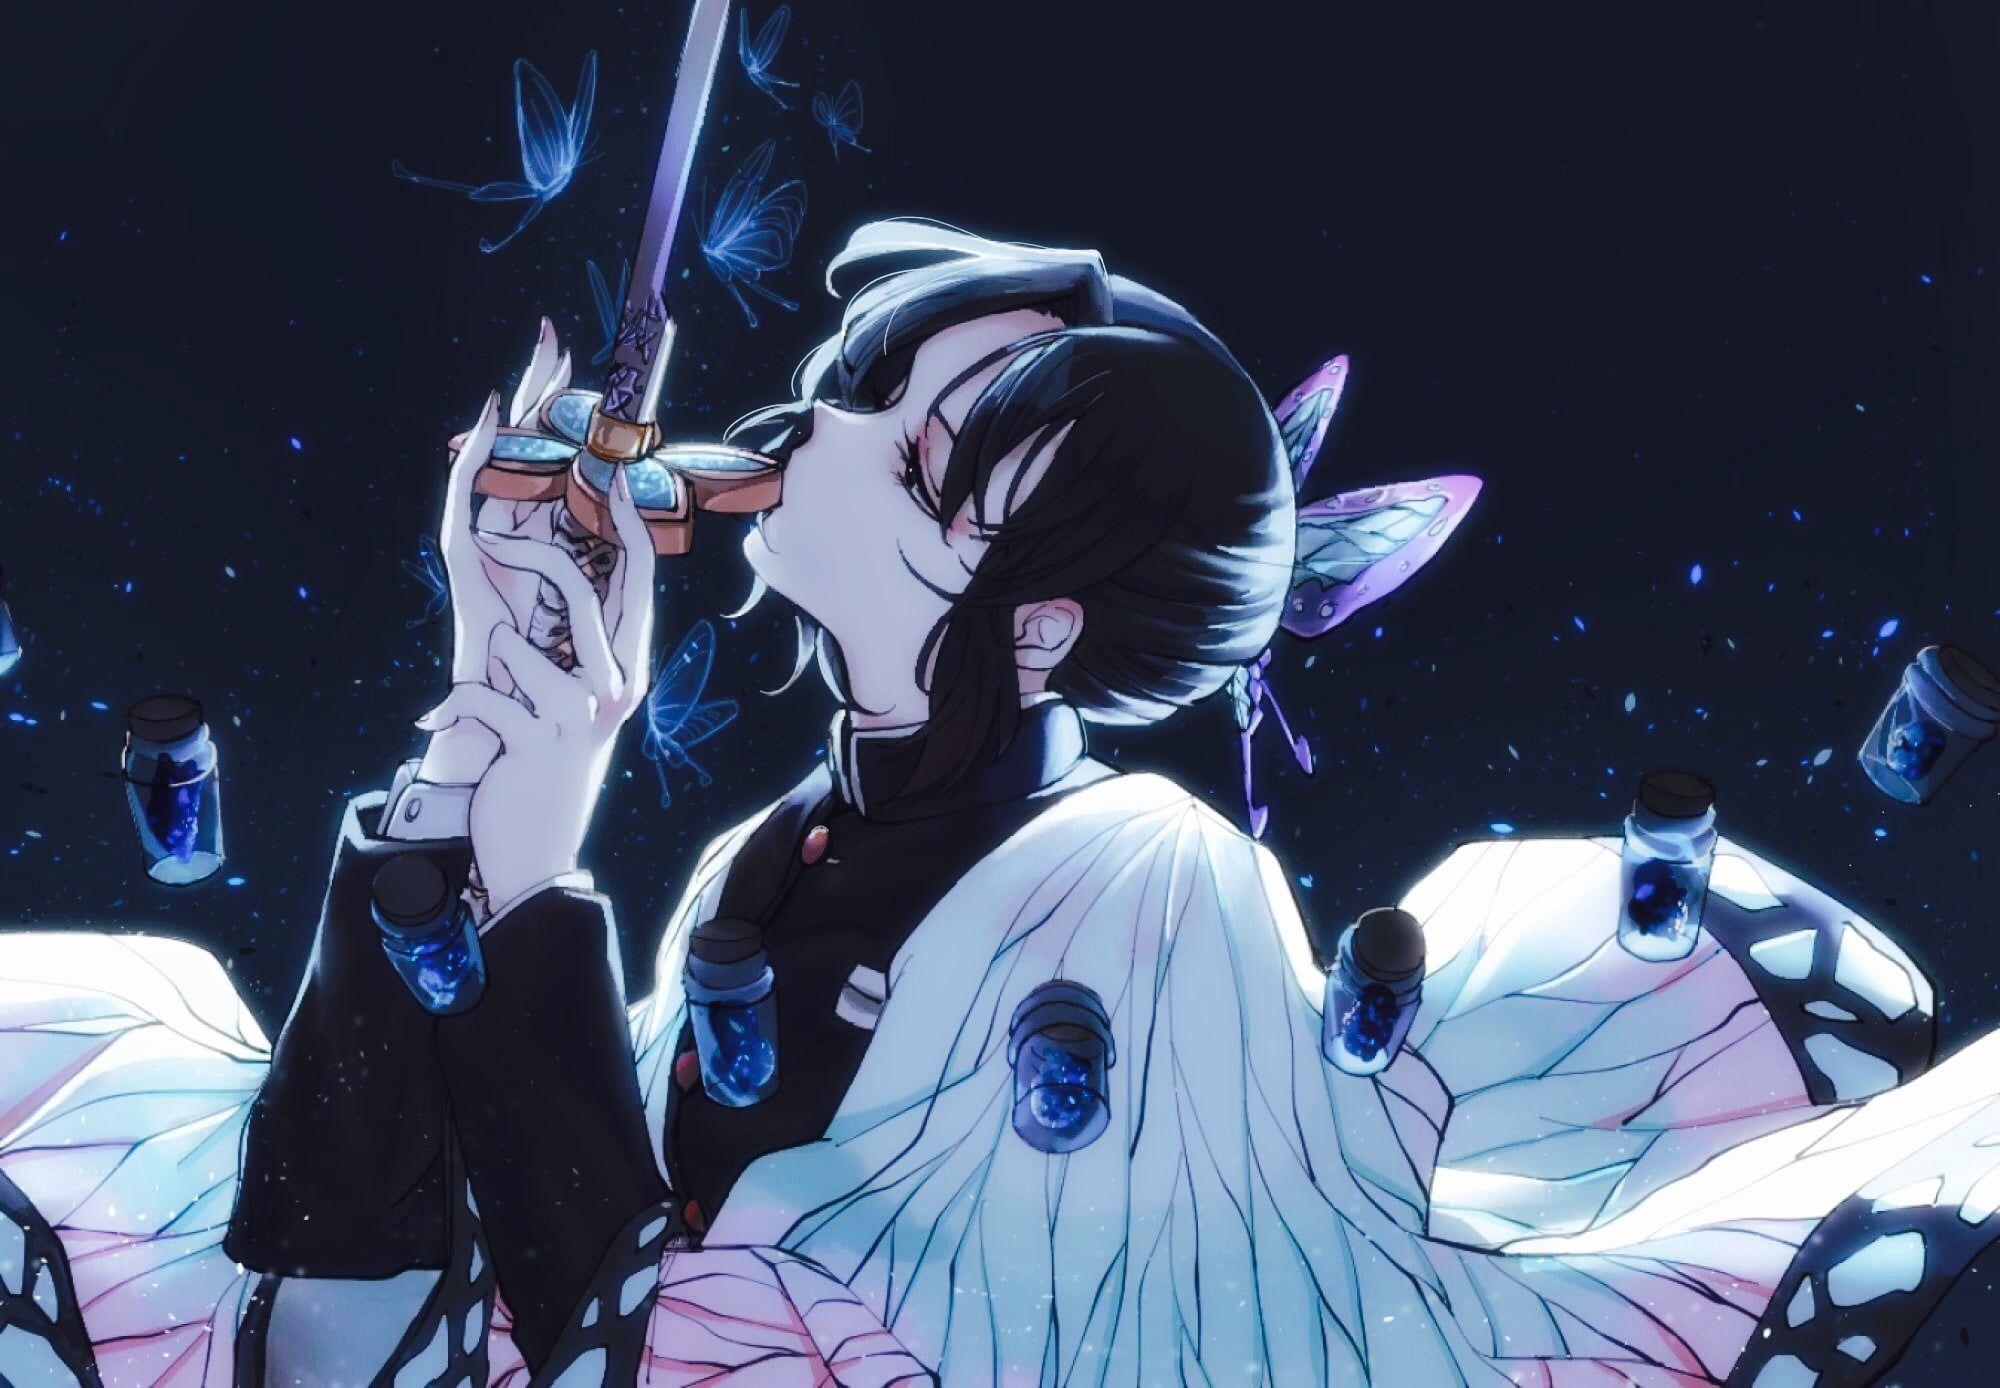 Kimetsu no Yaiba anime girls fantasy weapon 2D fan art